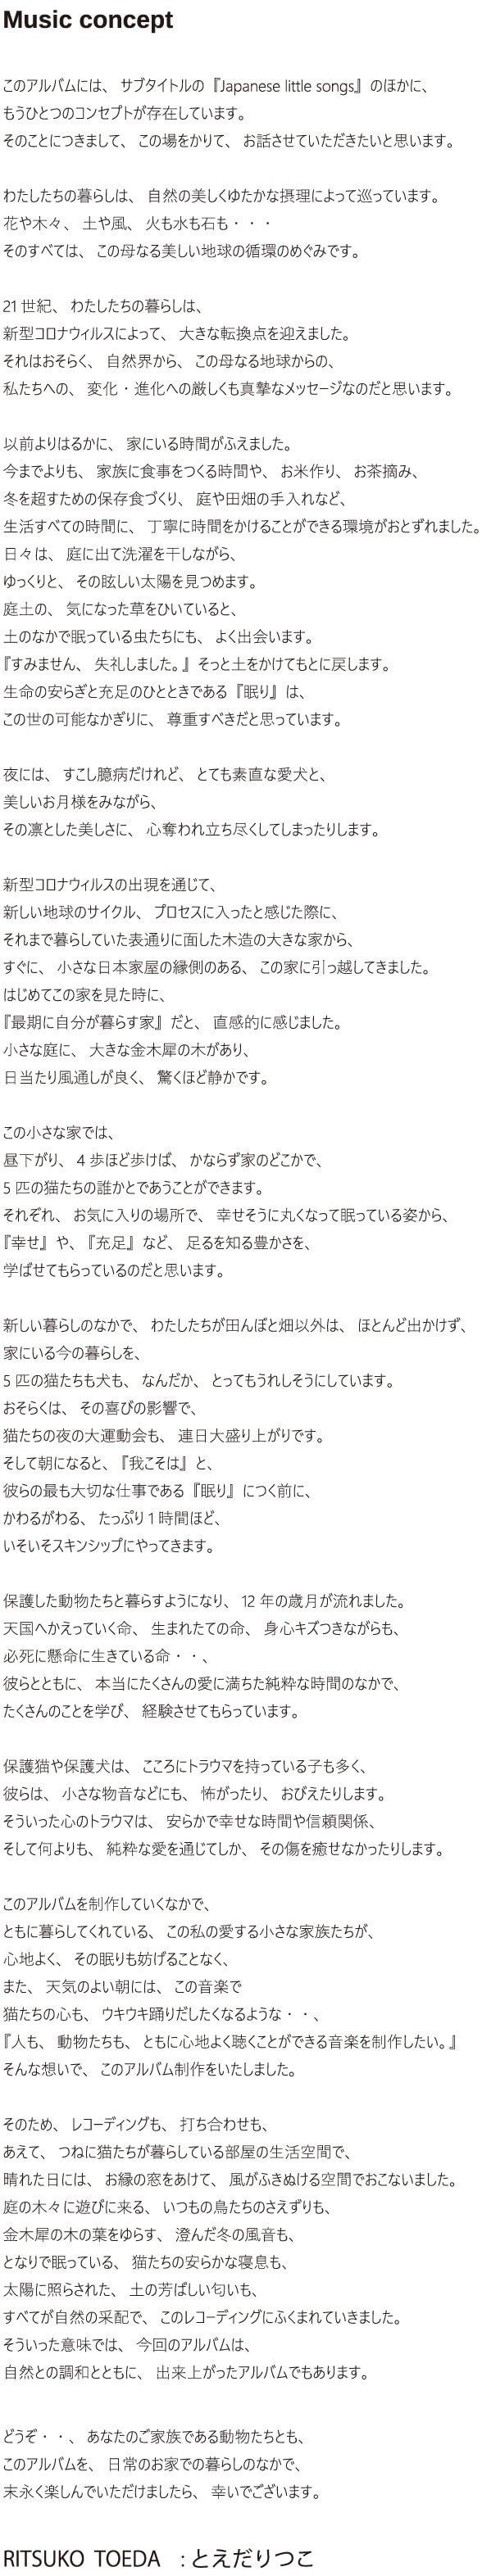 music_con_004.jpg